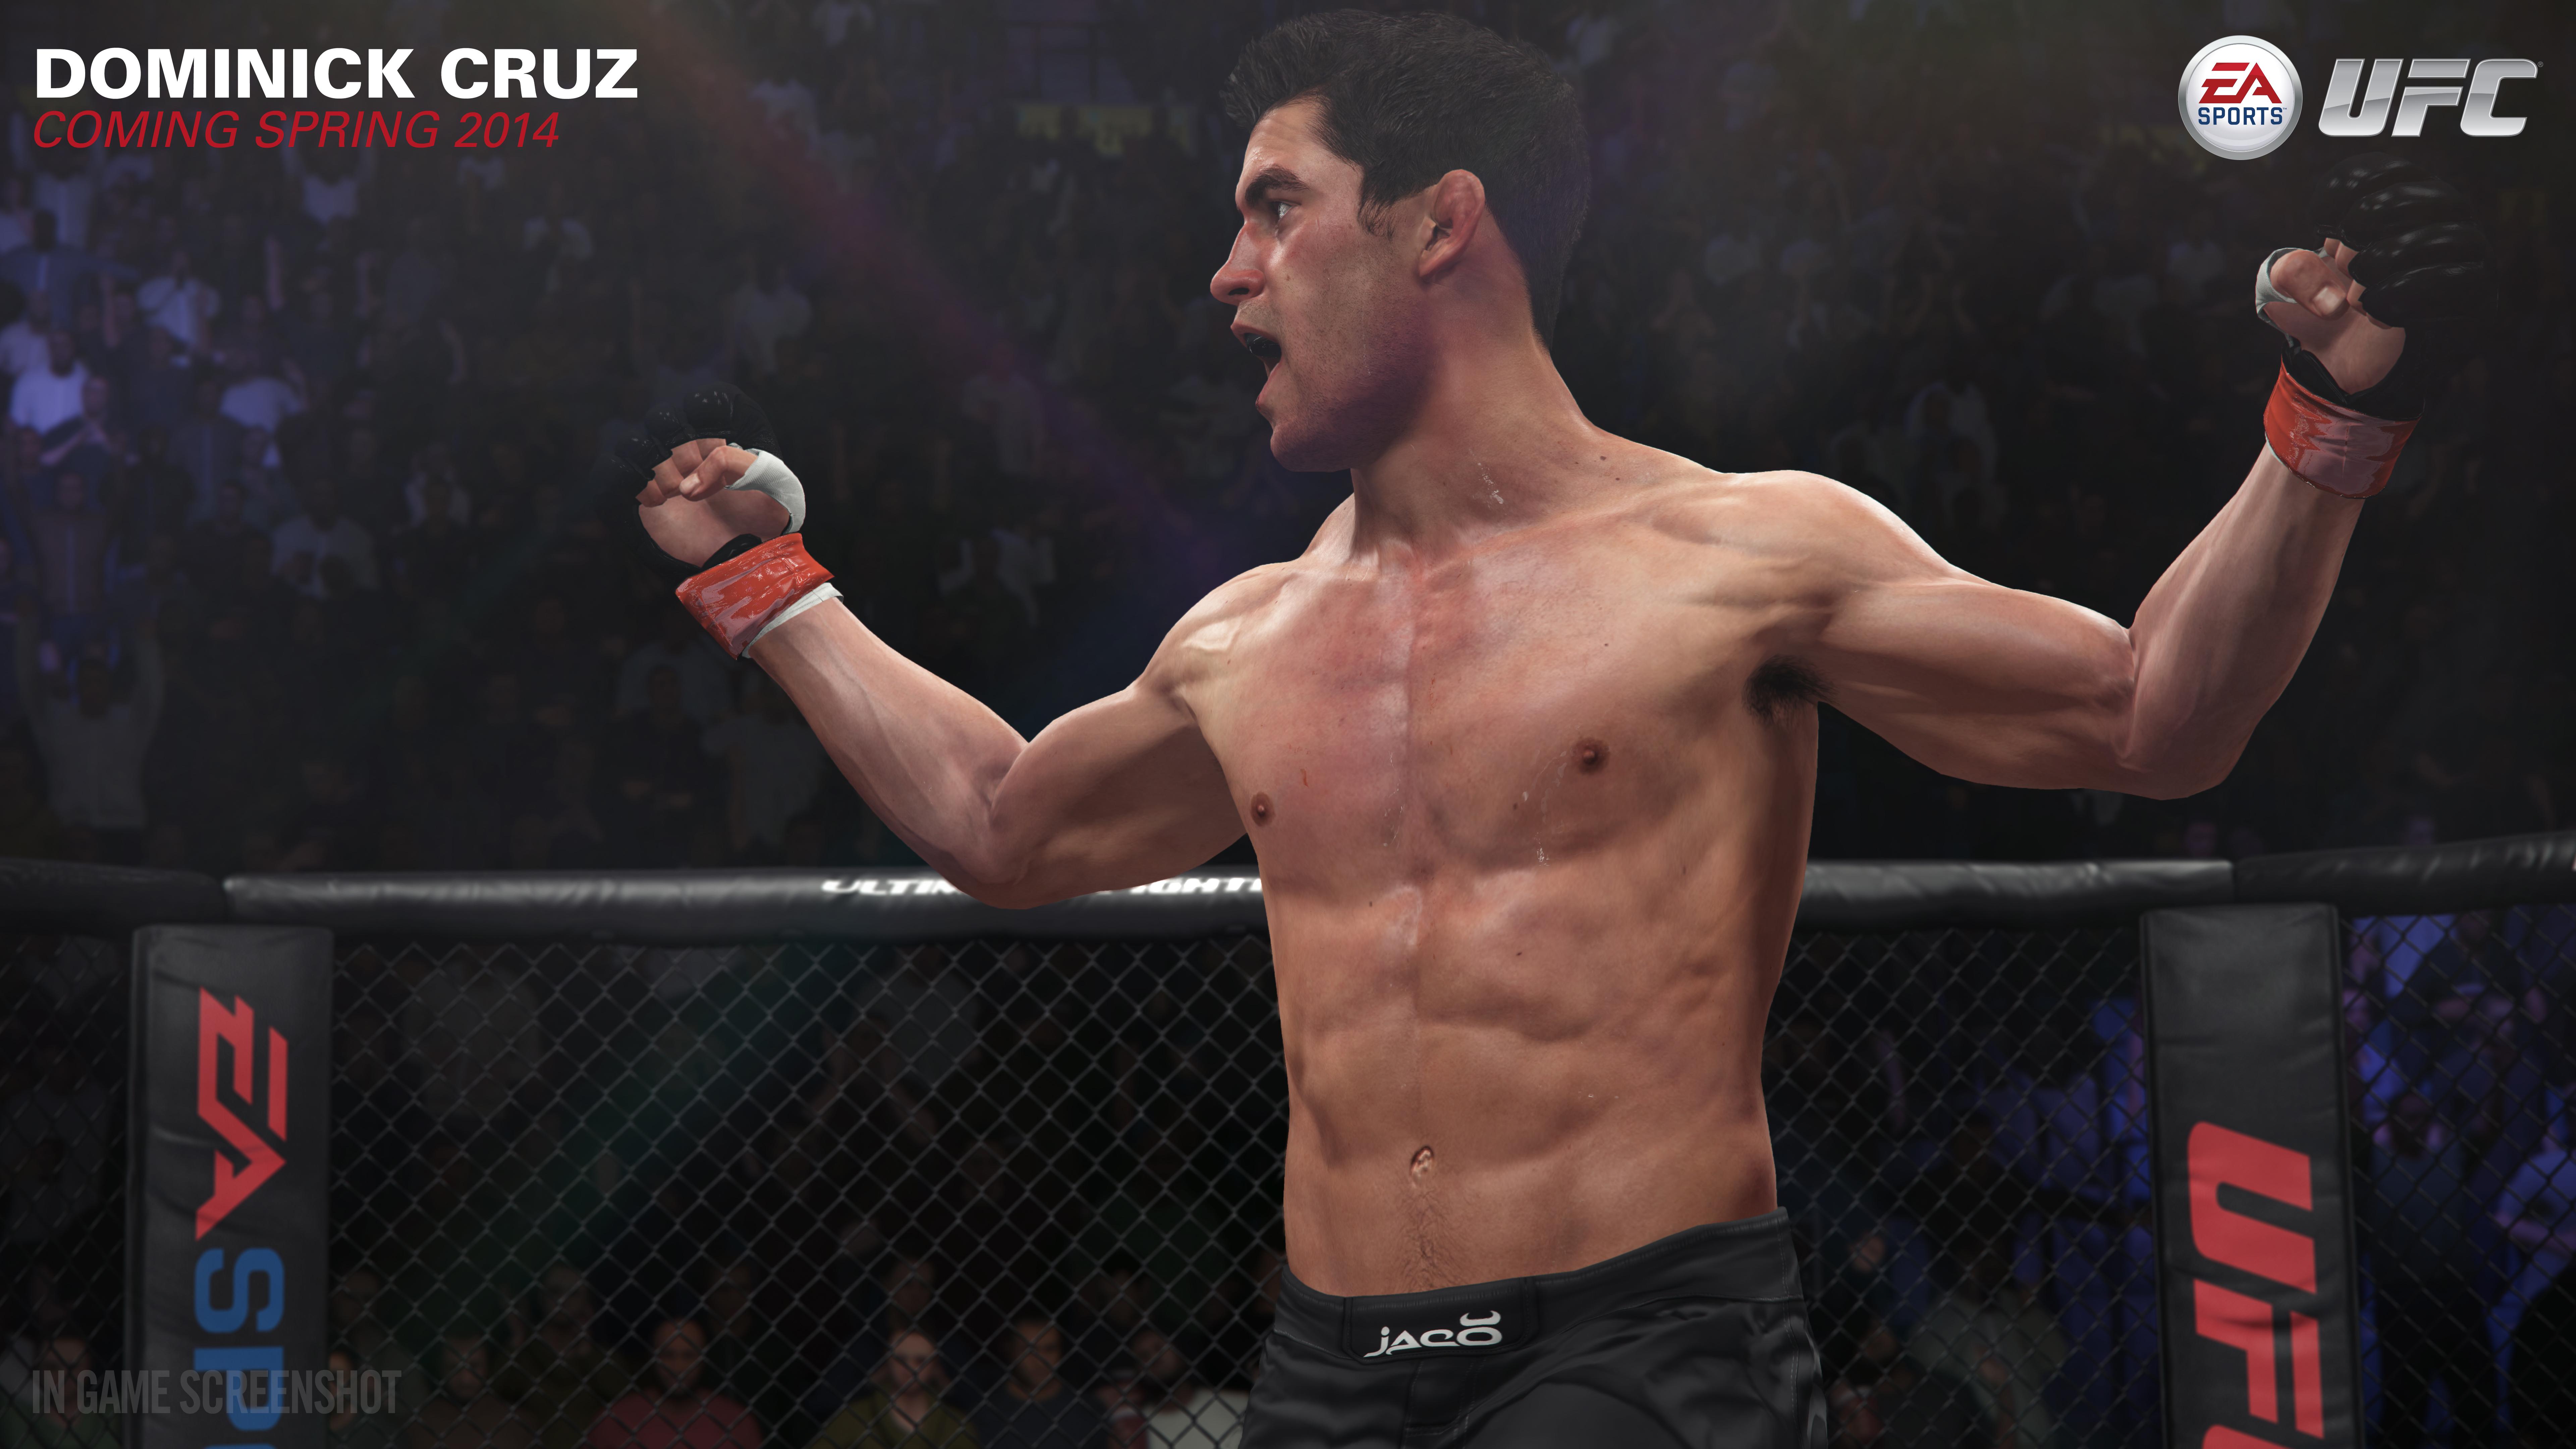 Доминик Круз - EA Sports UFC 8K